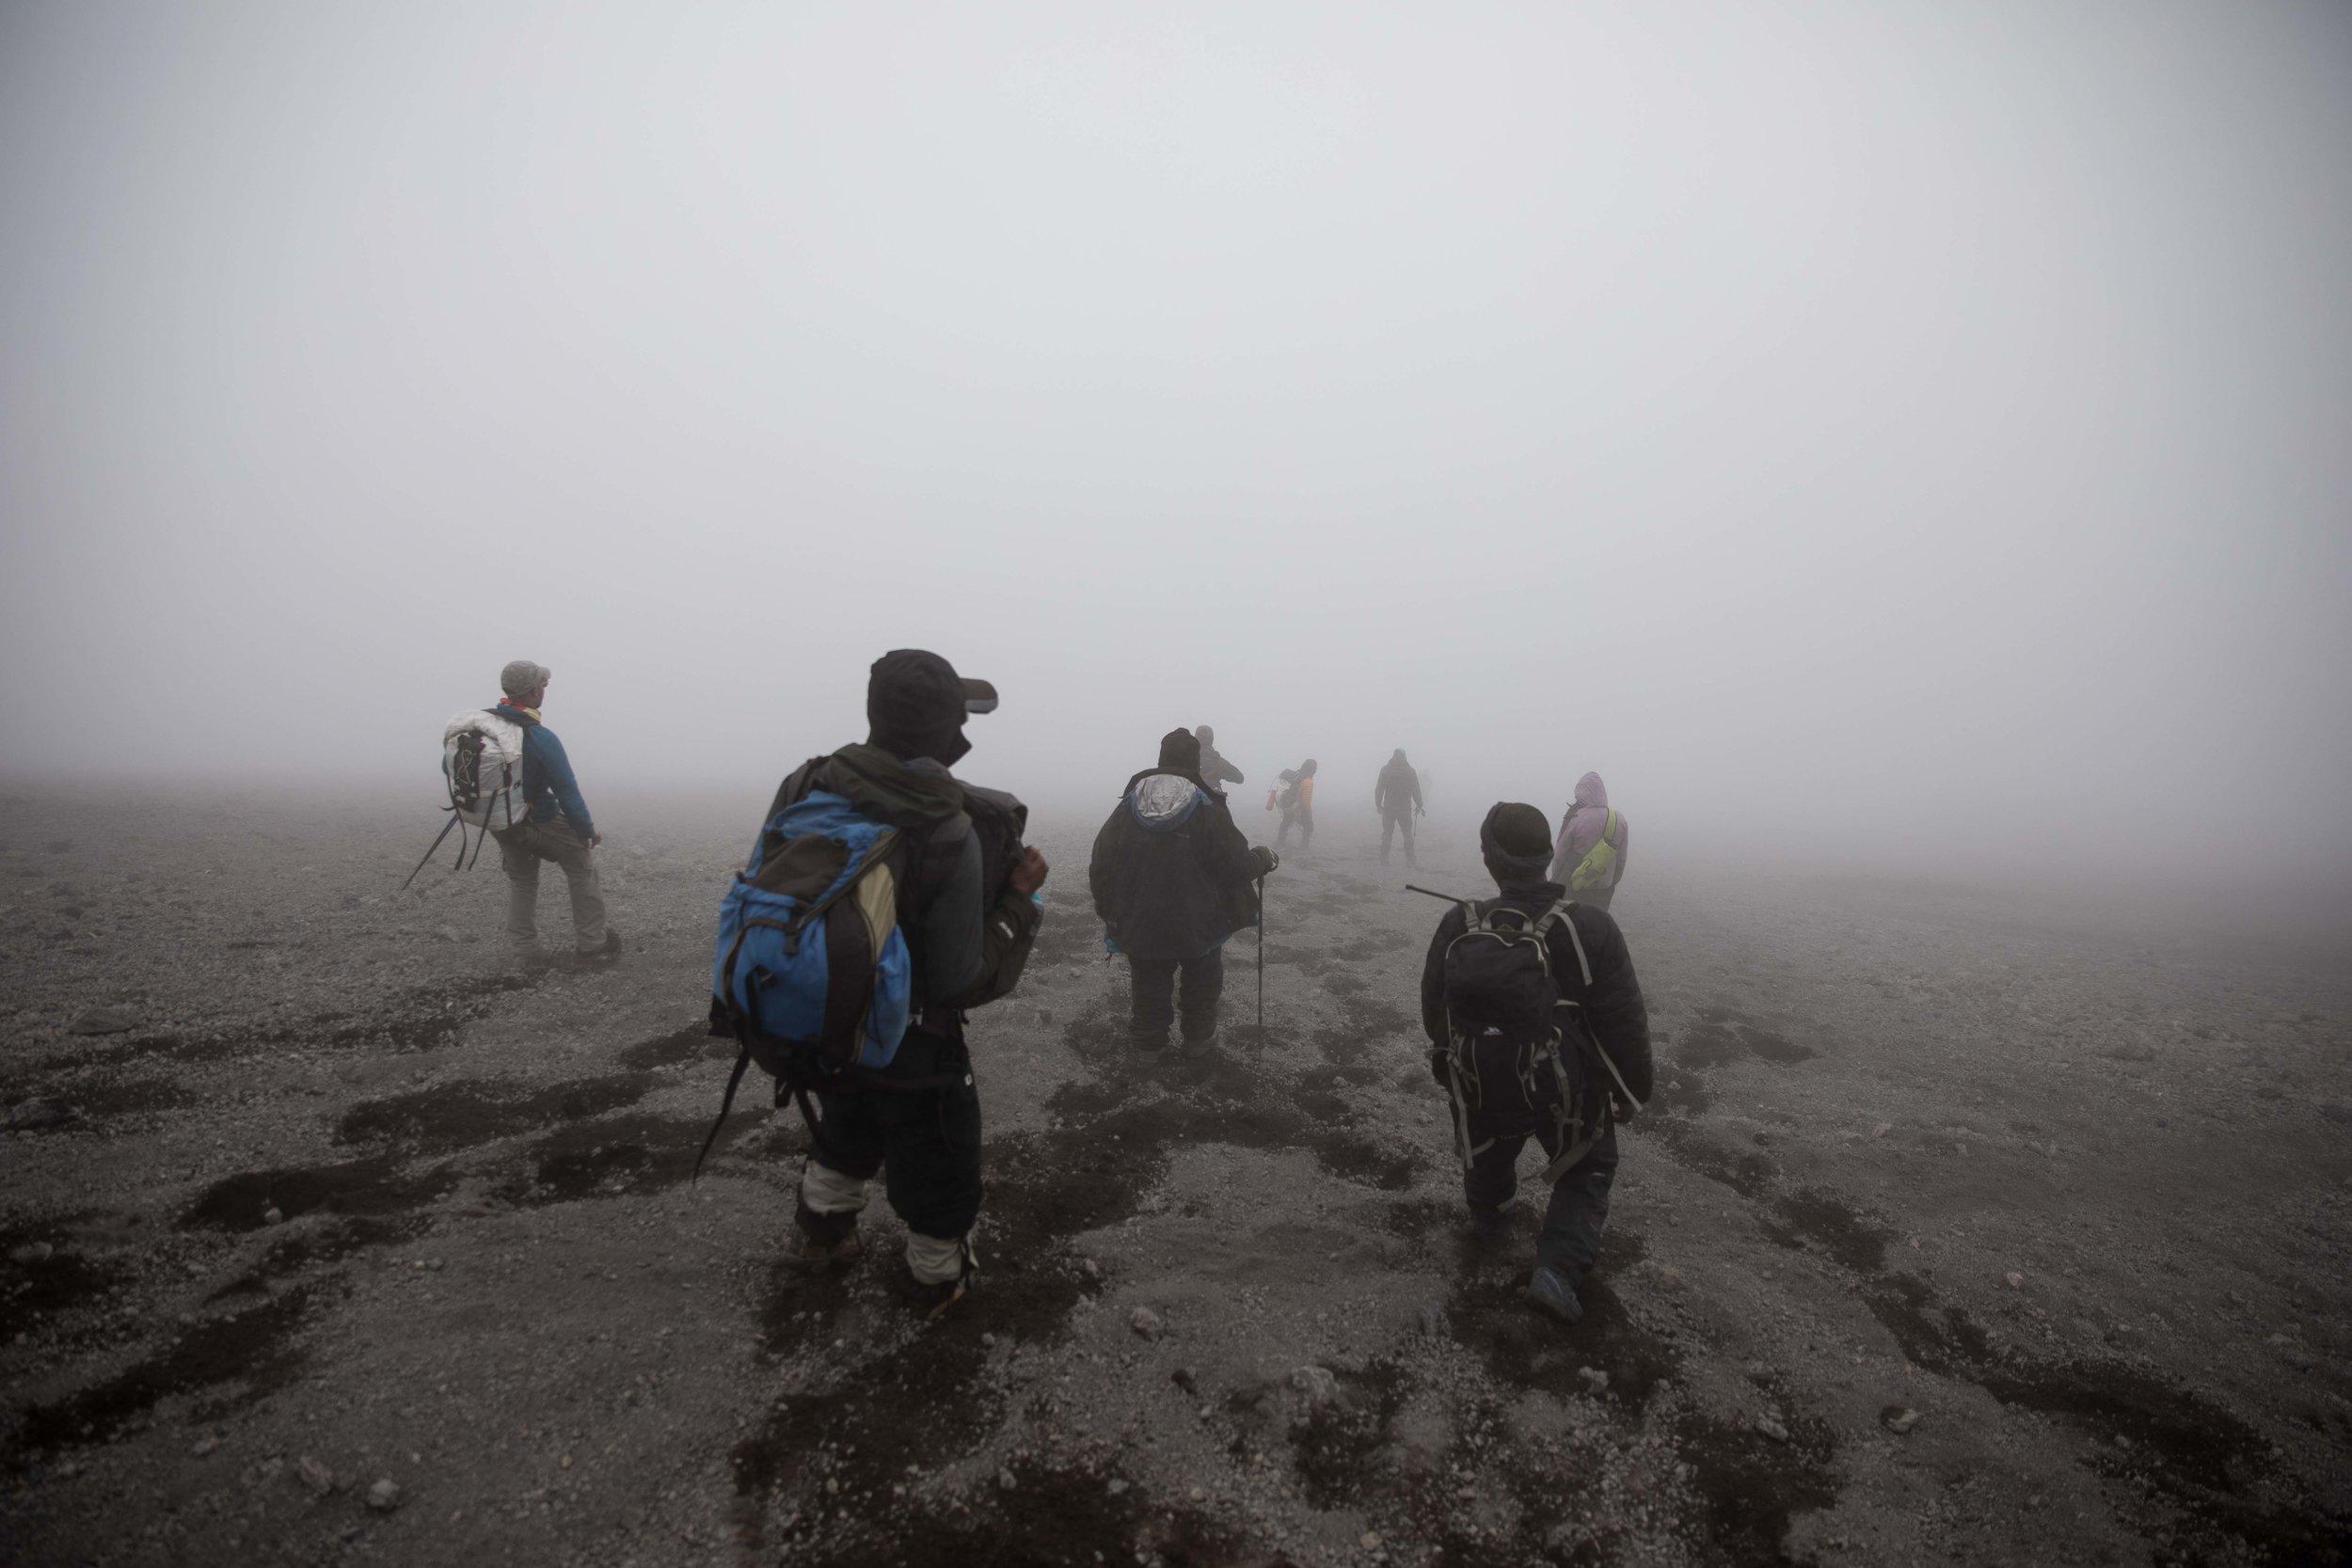 ajw_REI_Kilimanjaro-55.jpg